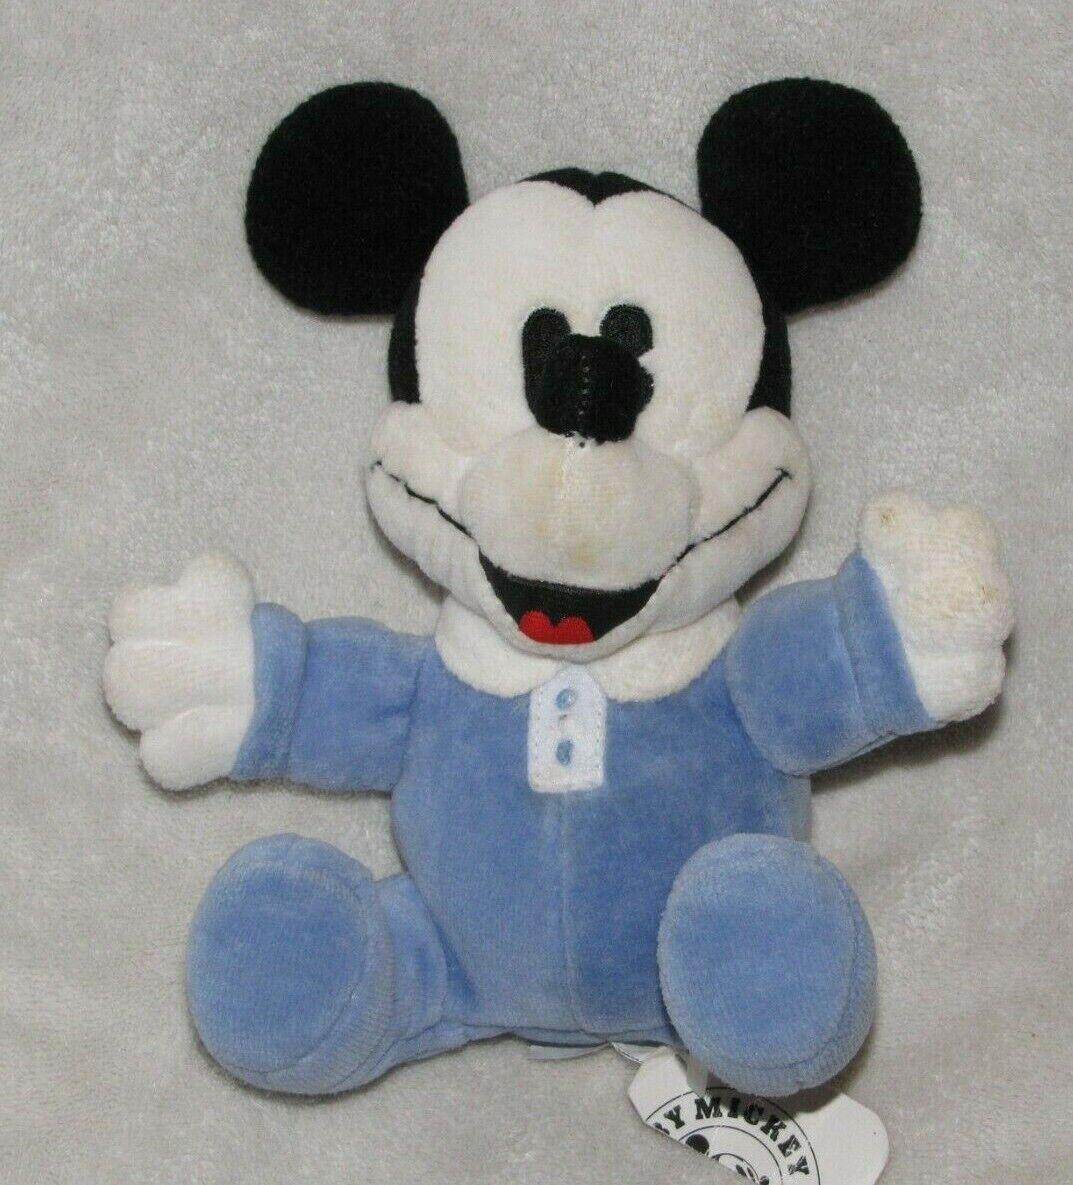 Gund Stuffed Plush 7263 Baby Mickey & Co Company Blau Mouse Velour Rattle Spielzeug